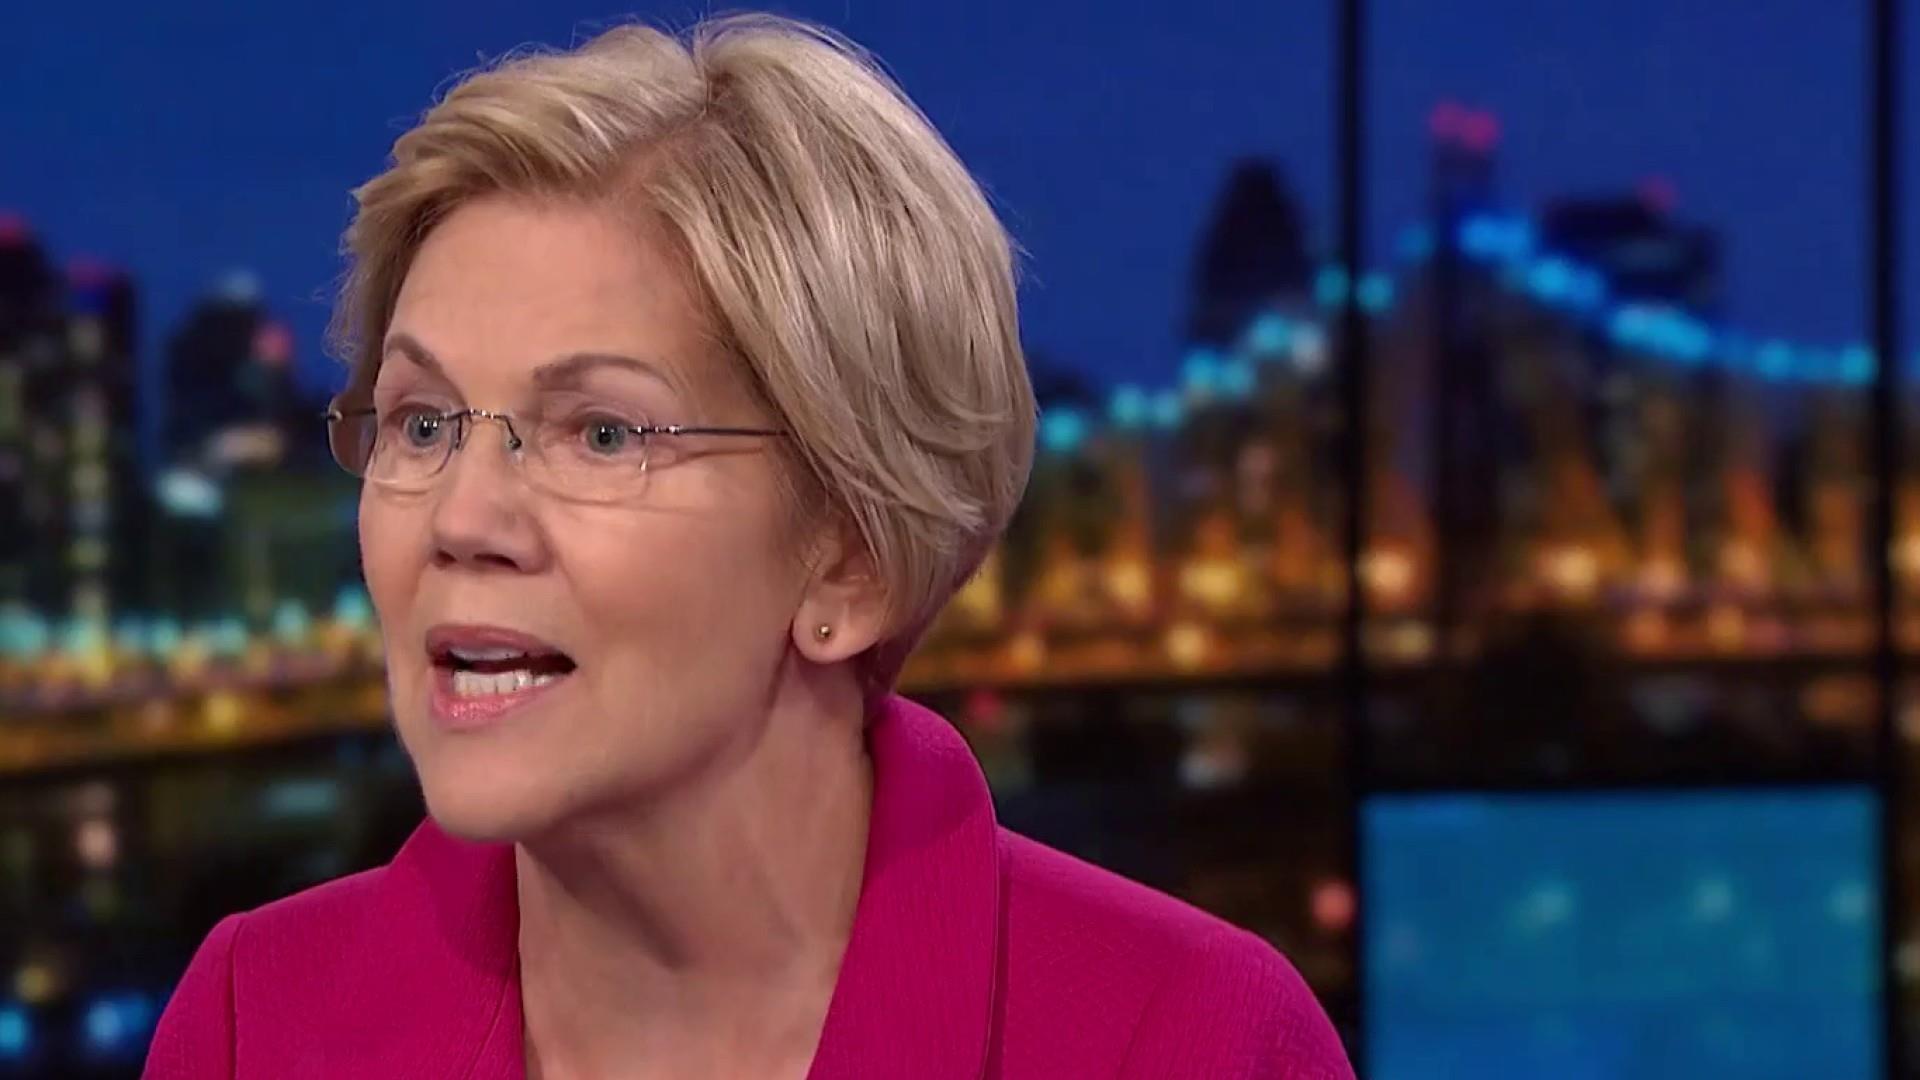 NBC/WSJ Poll: Warren has edge in 'enthusiasm'